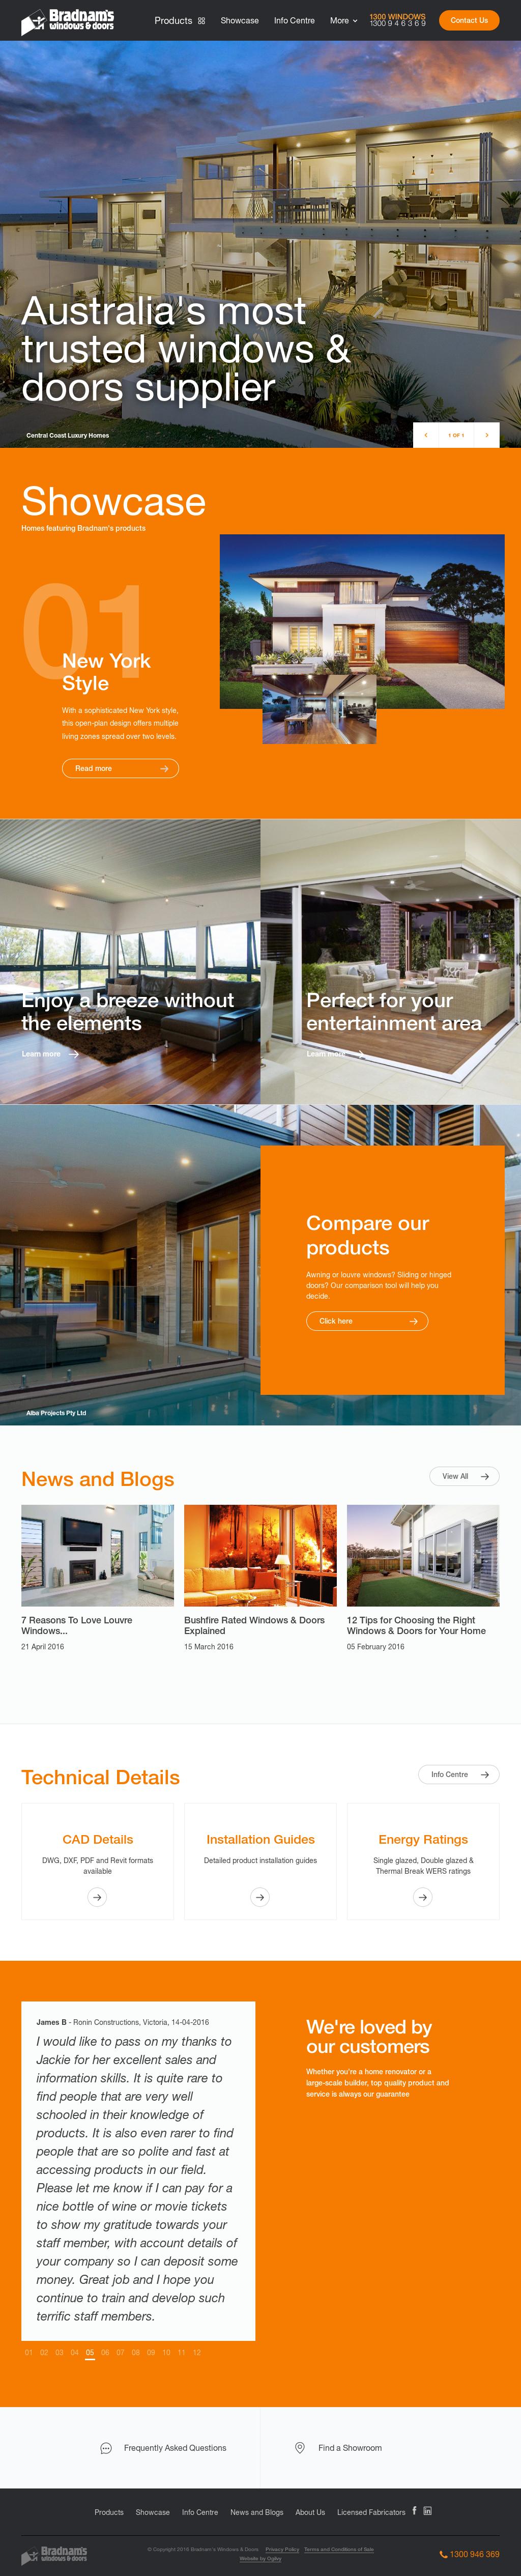 Bradnam's Windows & Doors Competitors, Revenue and Employees